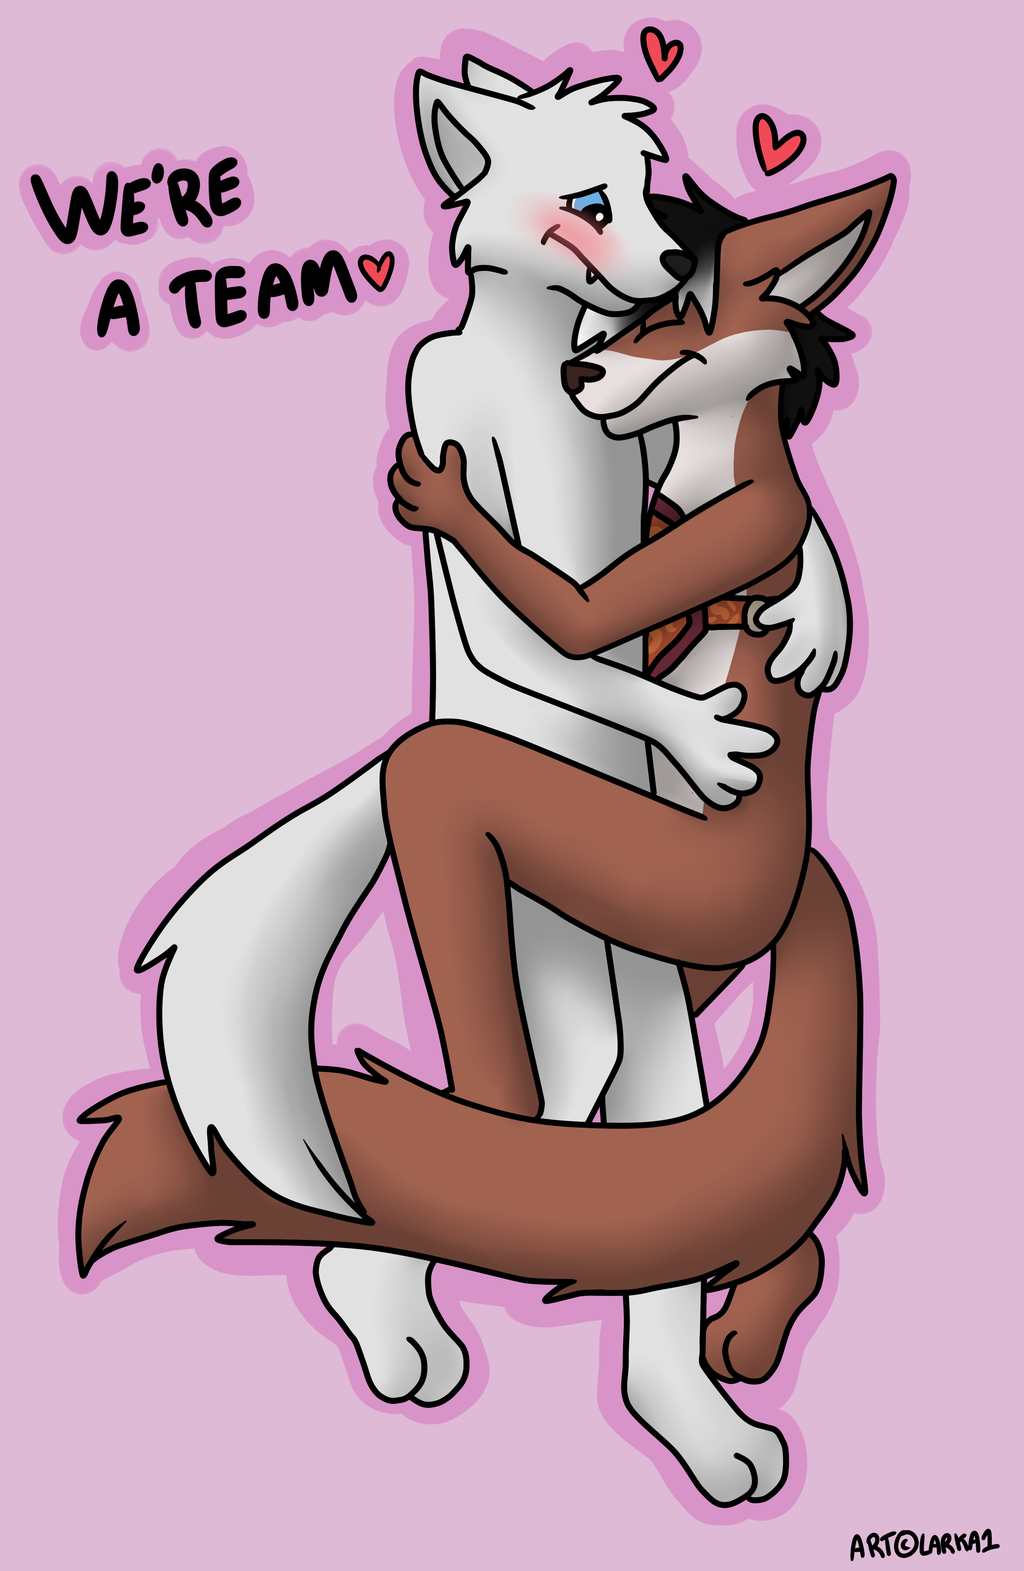 We're a Team